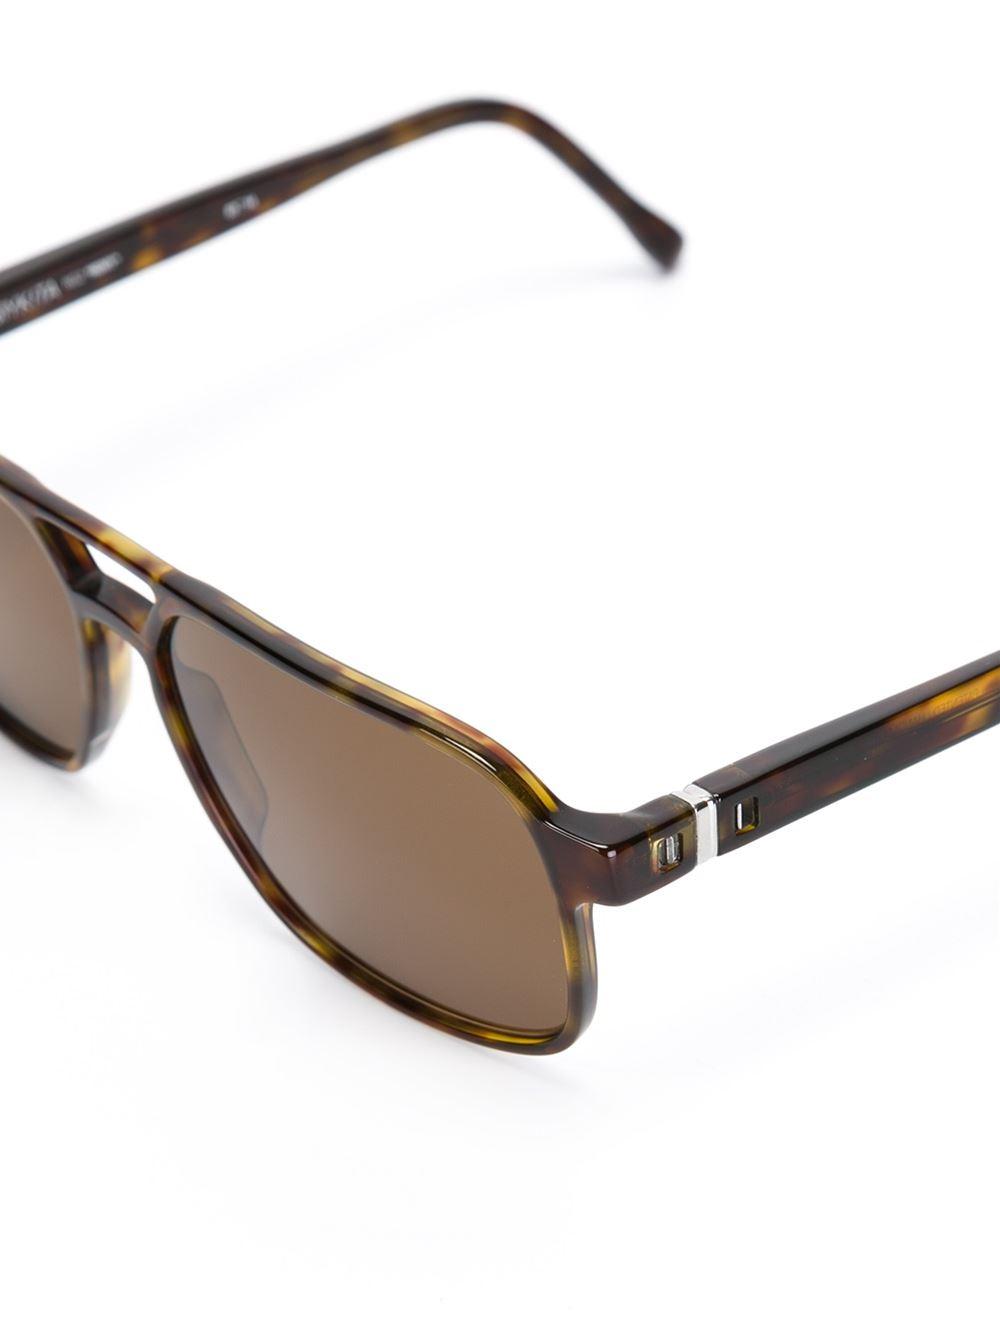 Mykita 'remy' Sunglasses in Brown